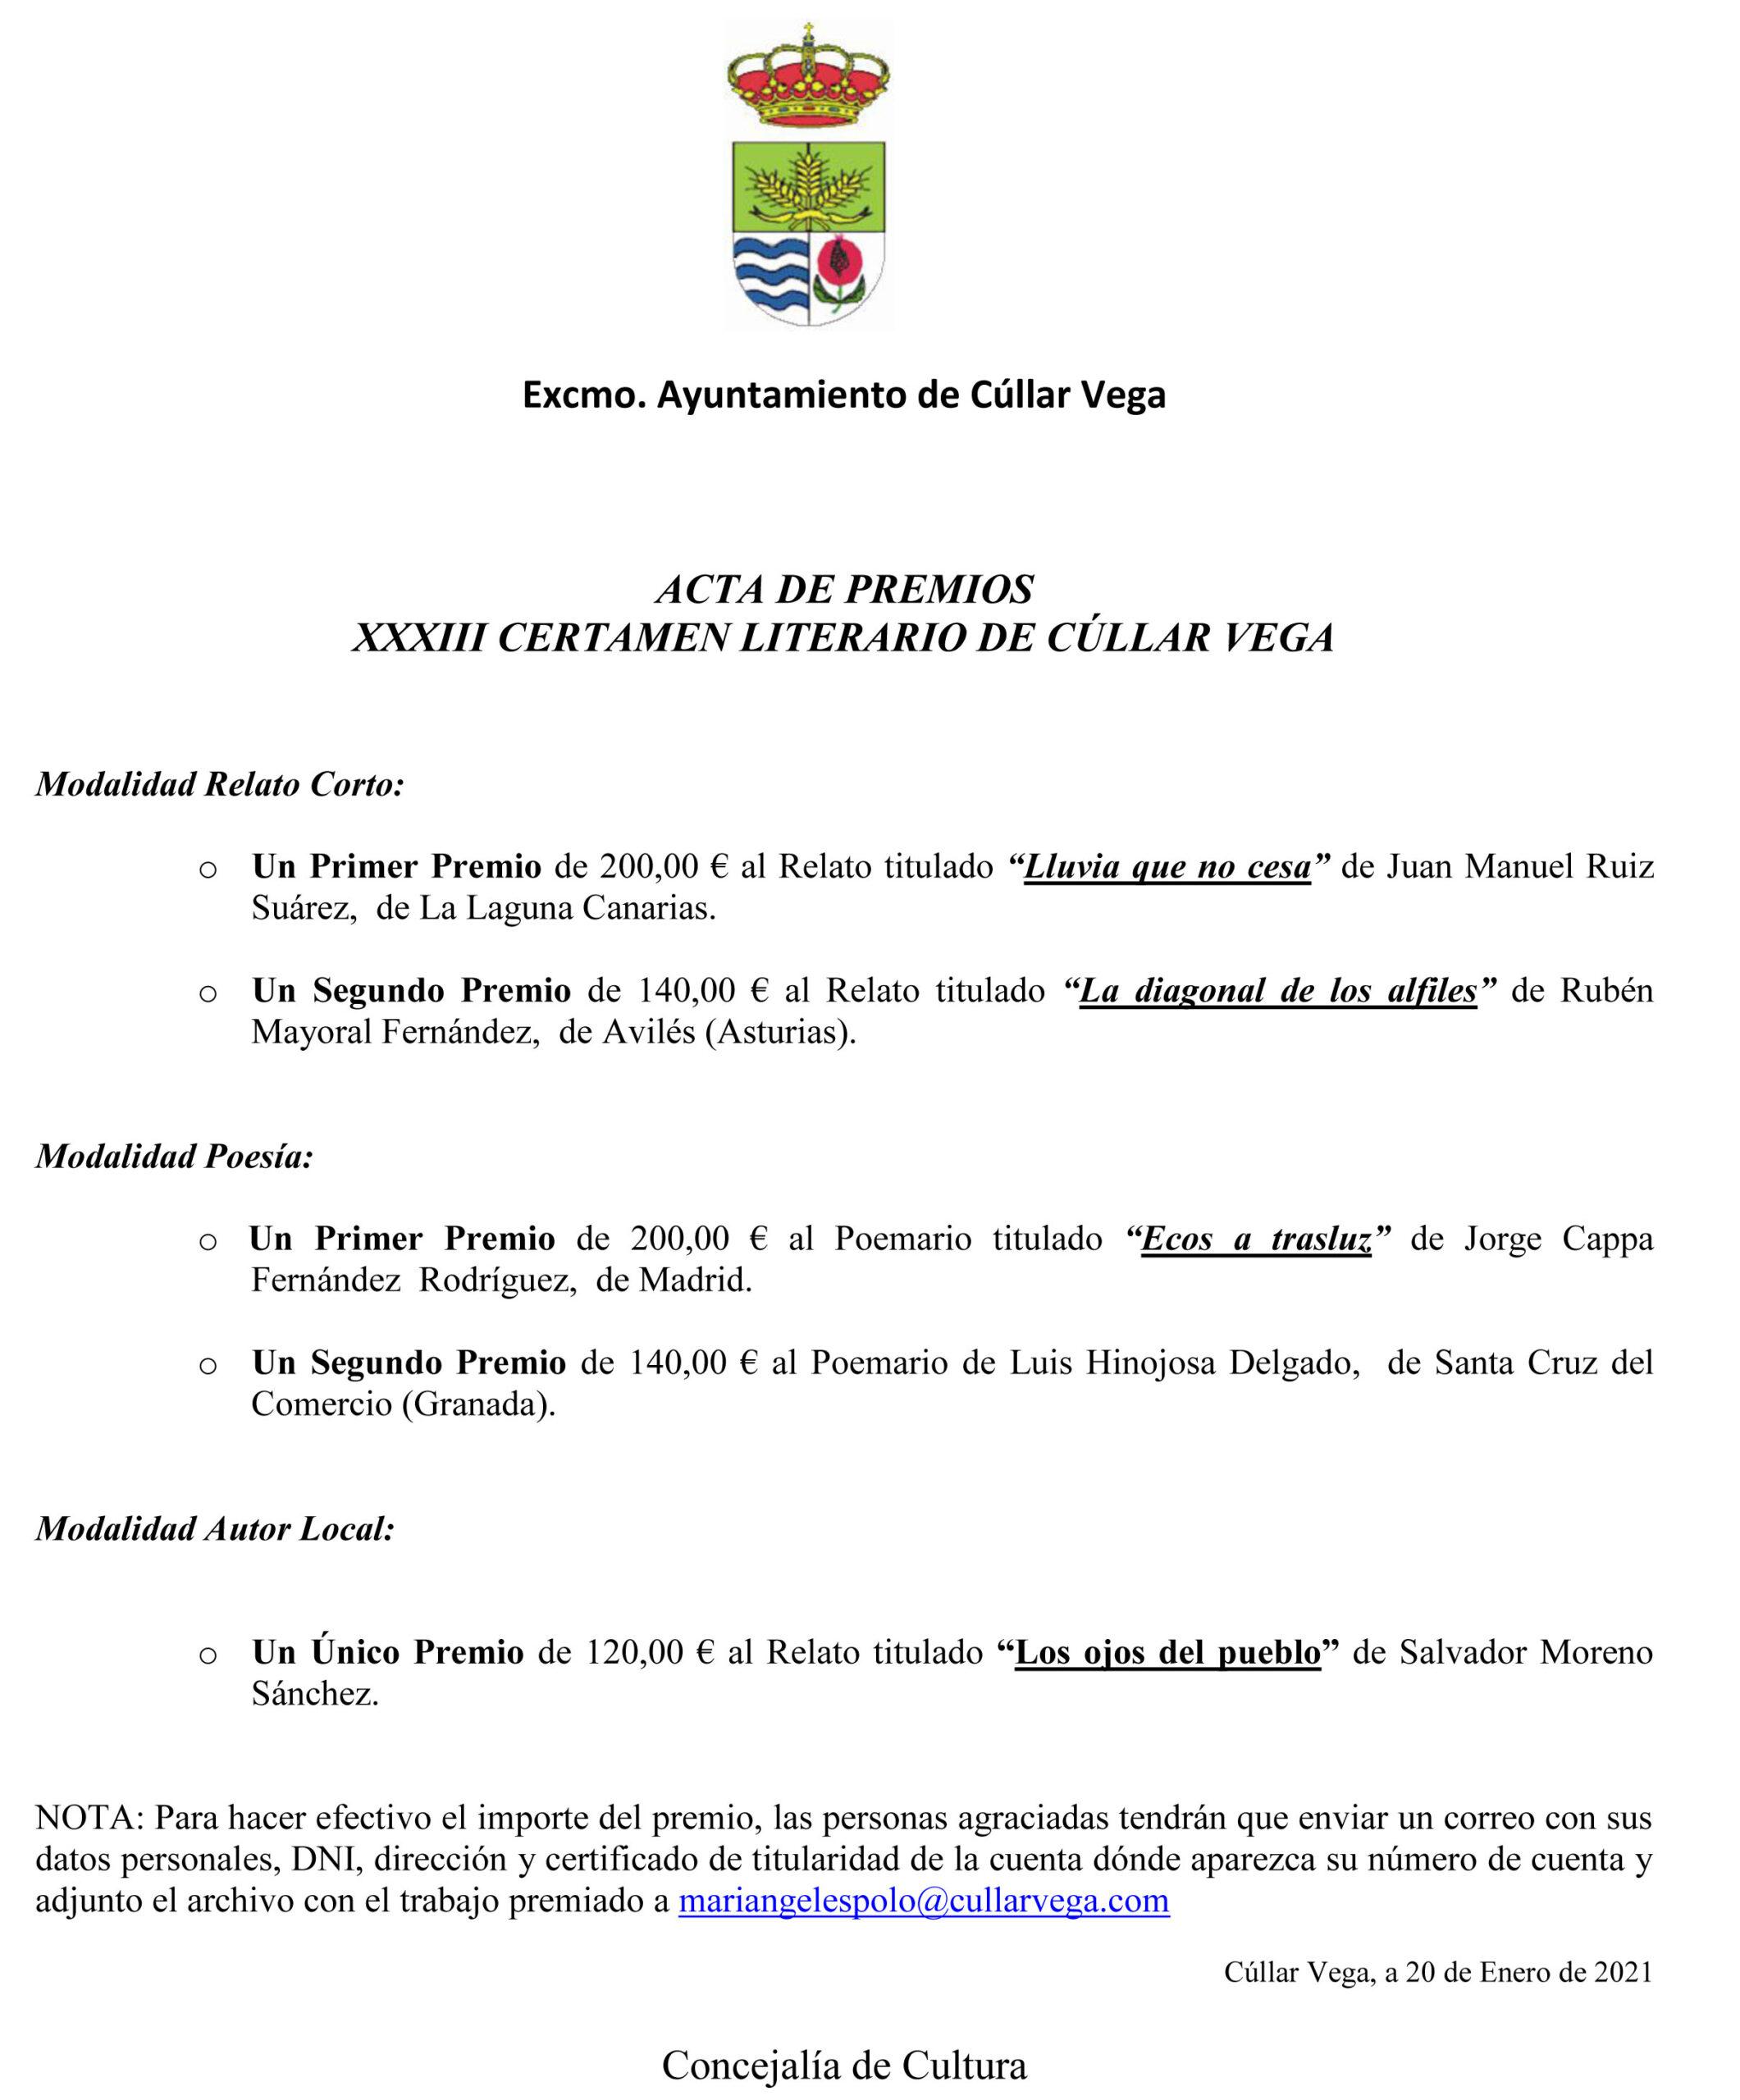 Premiados del XXXIII Certamen Literario de Cúllar Vega